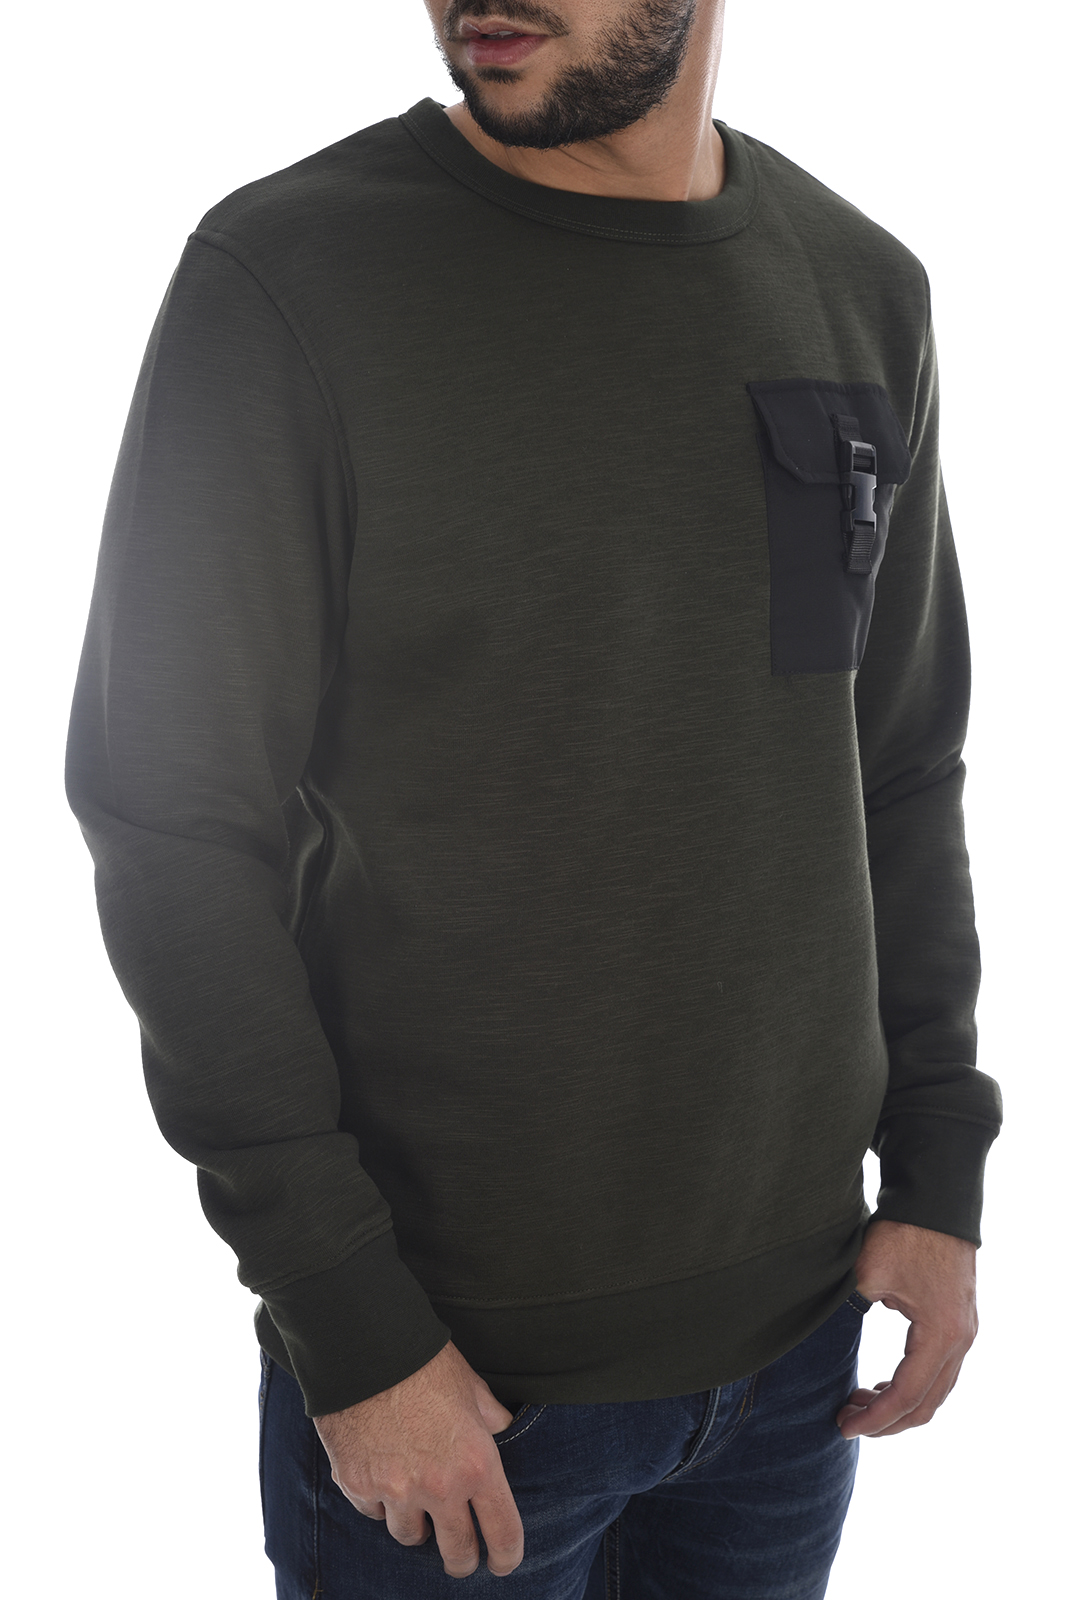 Sweatshirts  Jack & Jones STANN SWEAT CREW Rosin